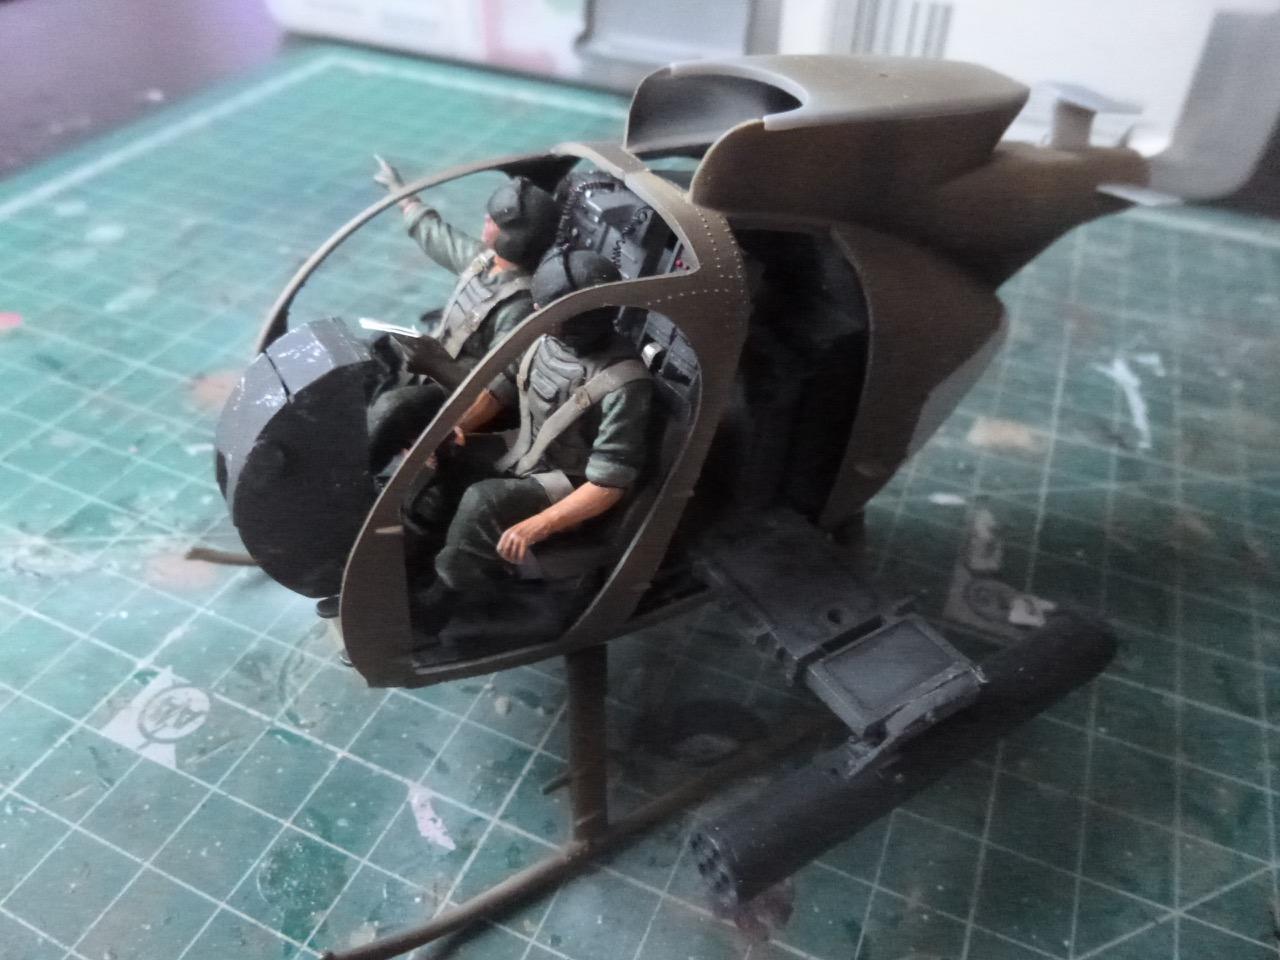 Hélicoptère AH6 little bird + équipage  Dragon 1/35 - Page 2 170627101444385732